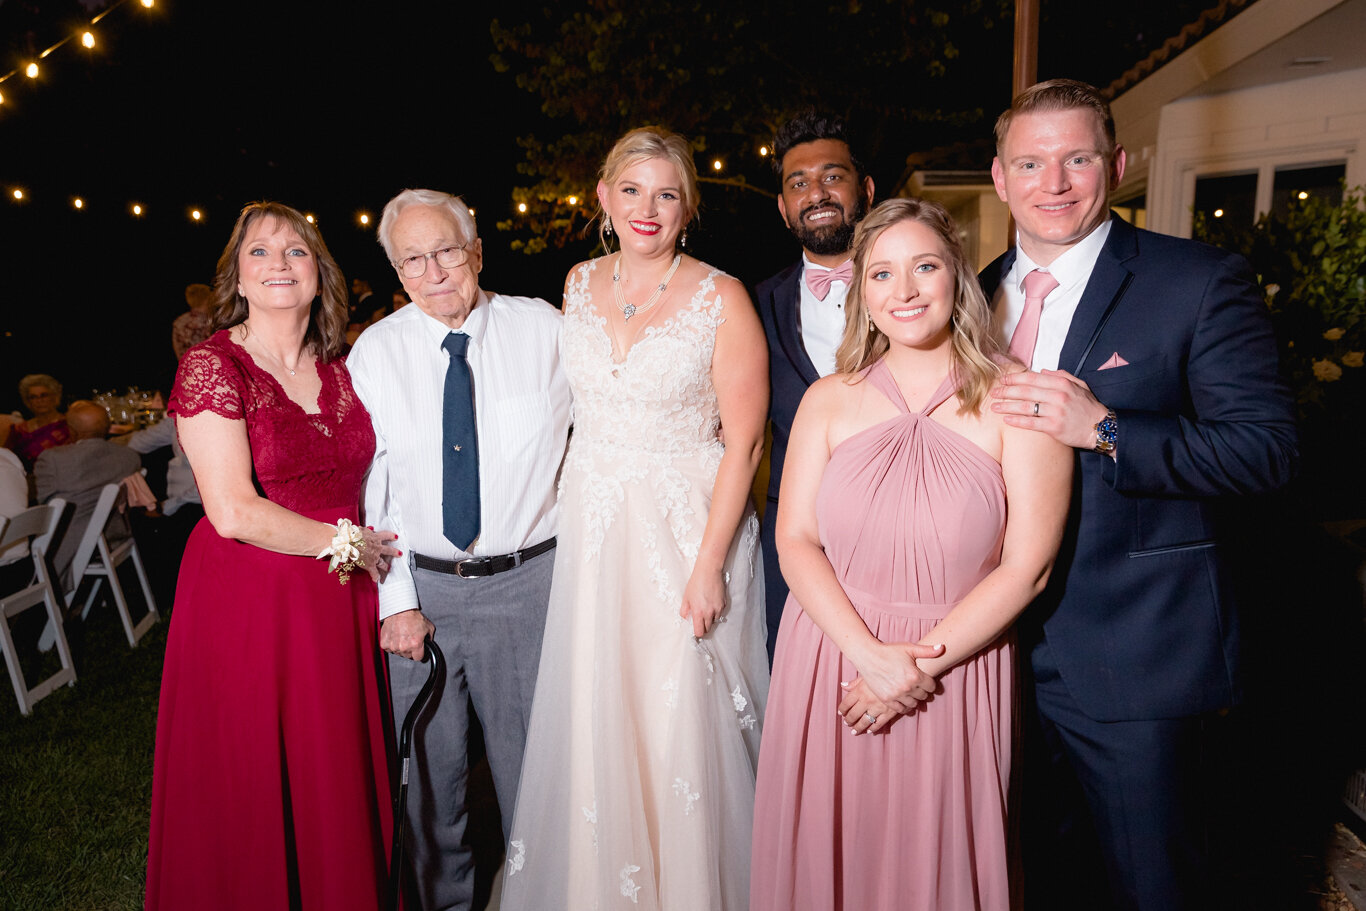 2019.08.24_Emily-Ashir-Wedding-at-the-Maples-6391.jpg